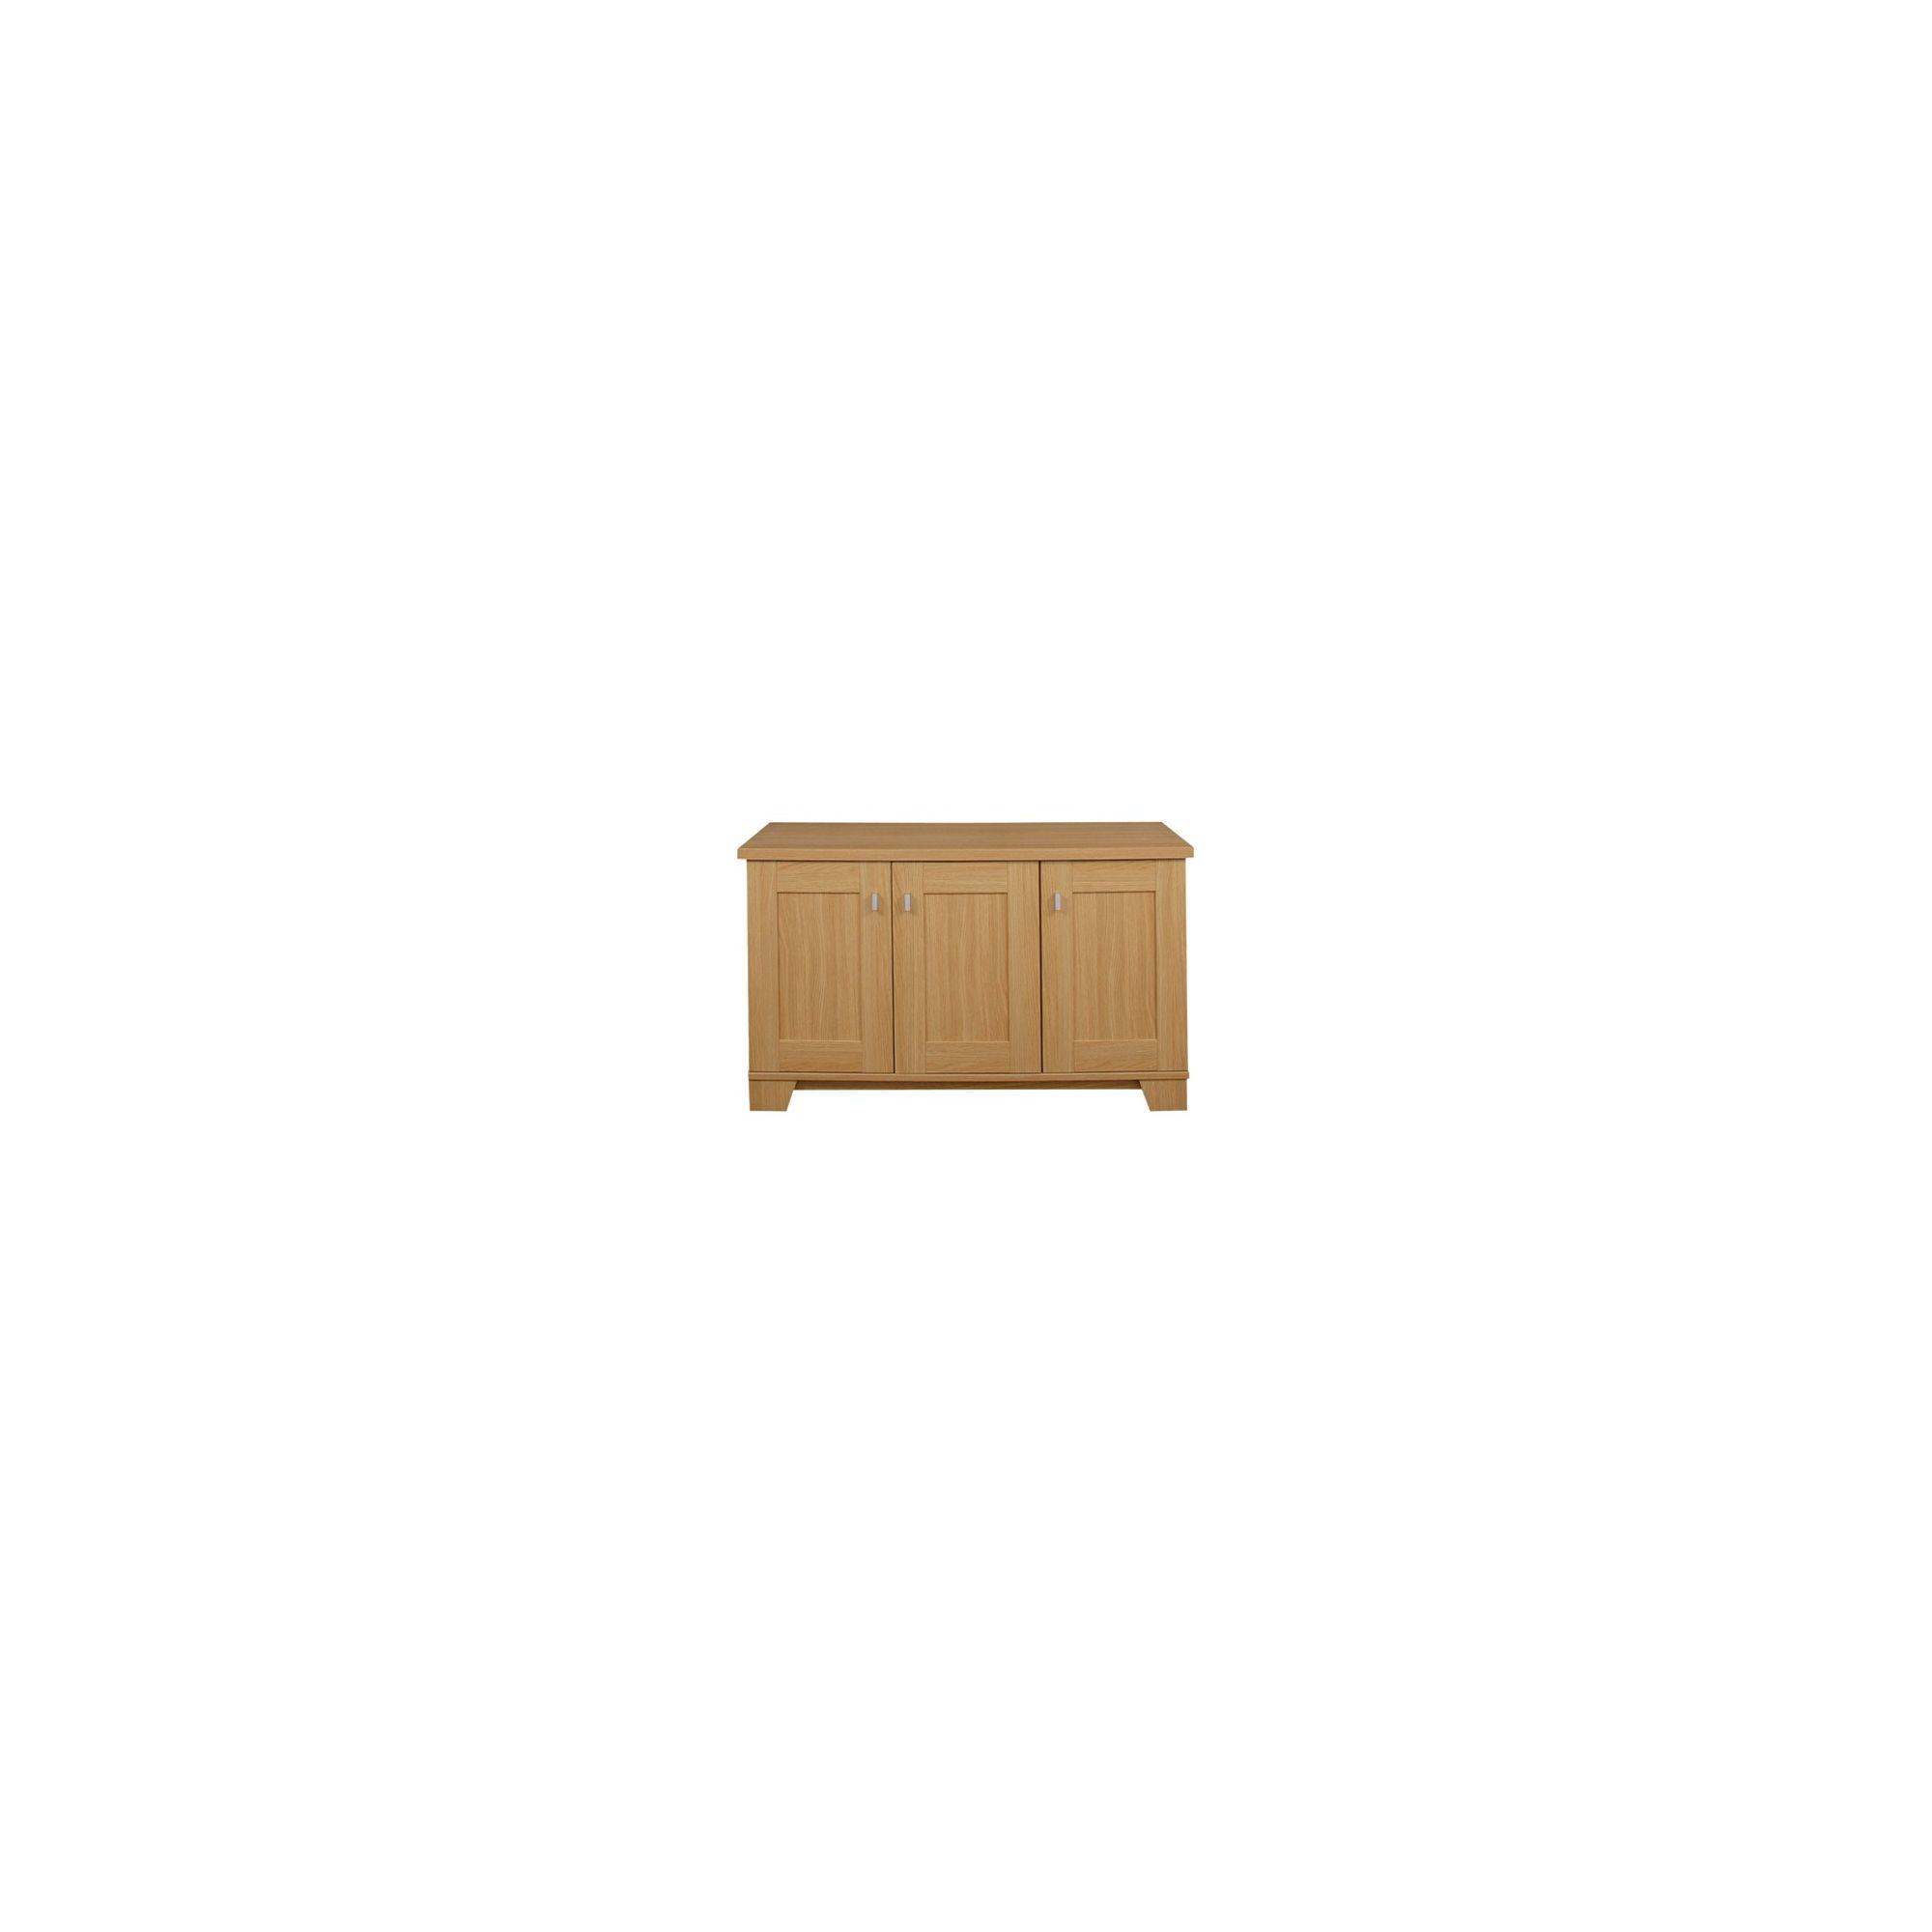 Caxton Sherwood 3 Door Sideboard in Natural Oak at Tesco Direct